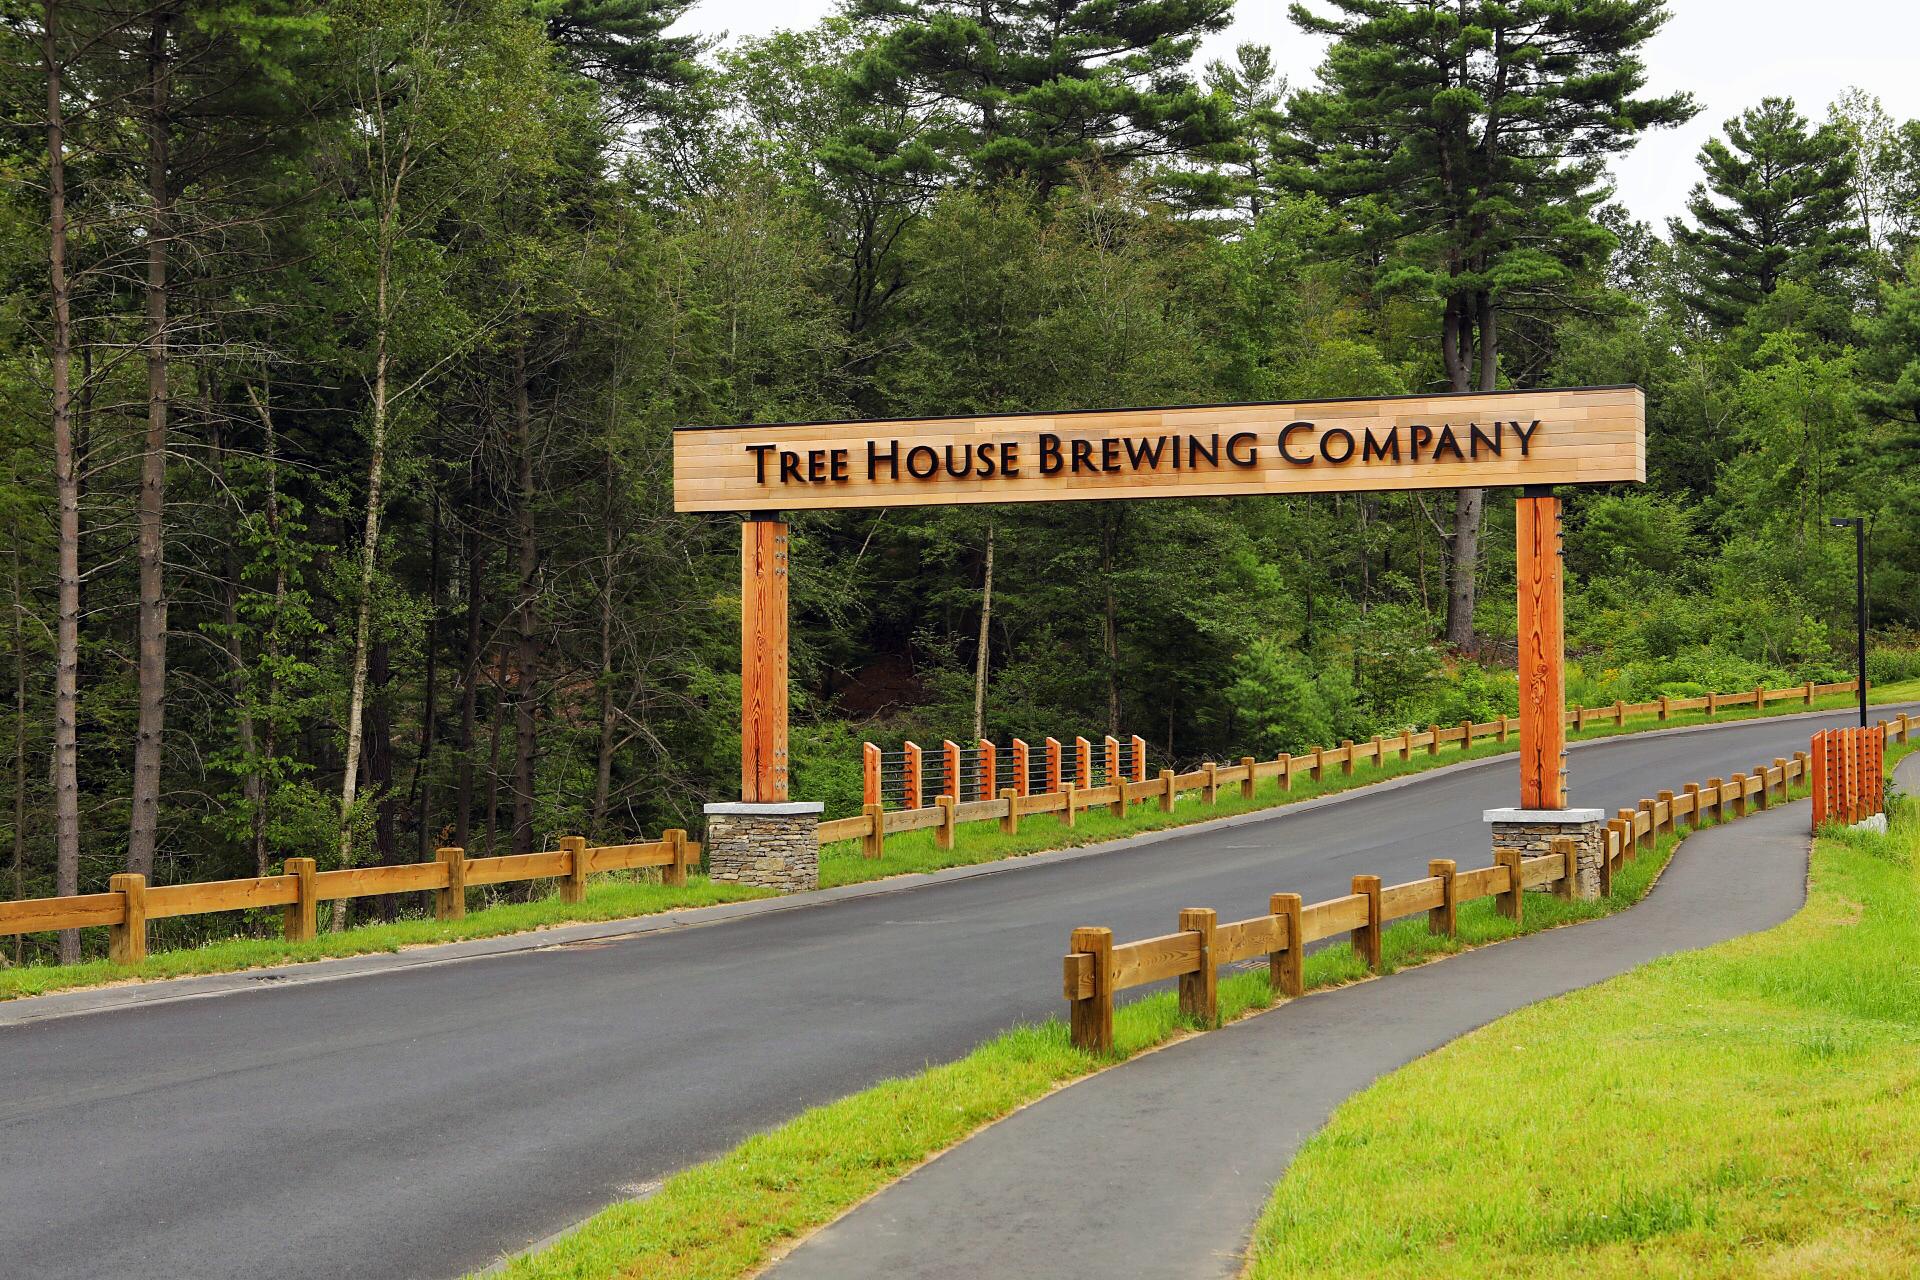 Tree House Photos Tree House Brewing Co